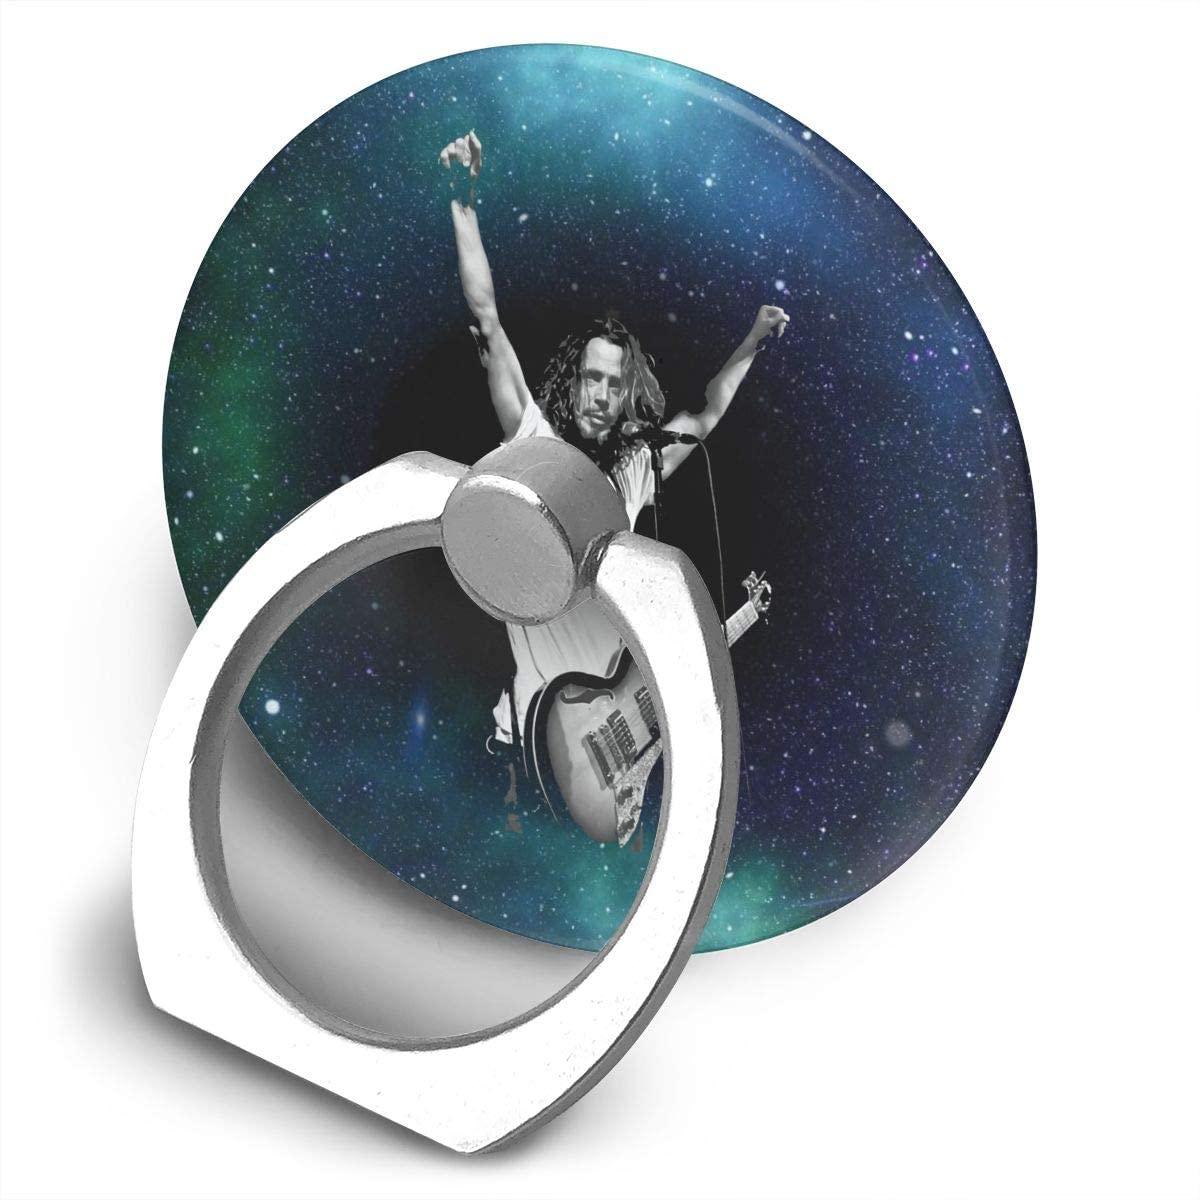 Kemeicle Chris Cornell 1 360 Rotating Ring Stand Cellphone Bracket Holder